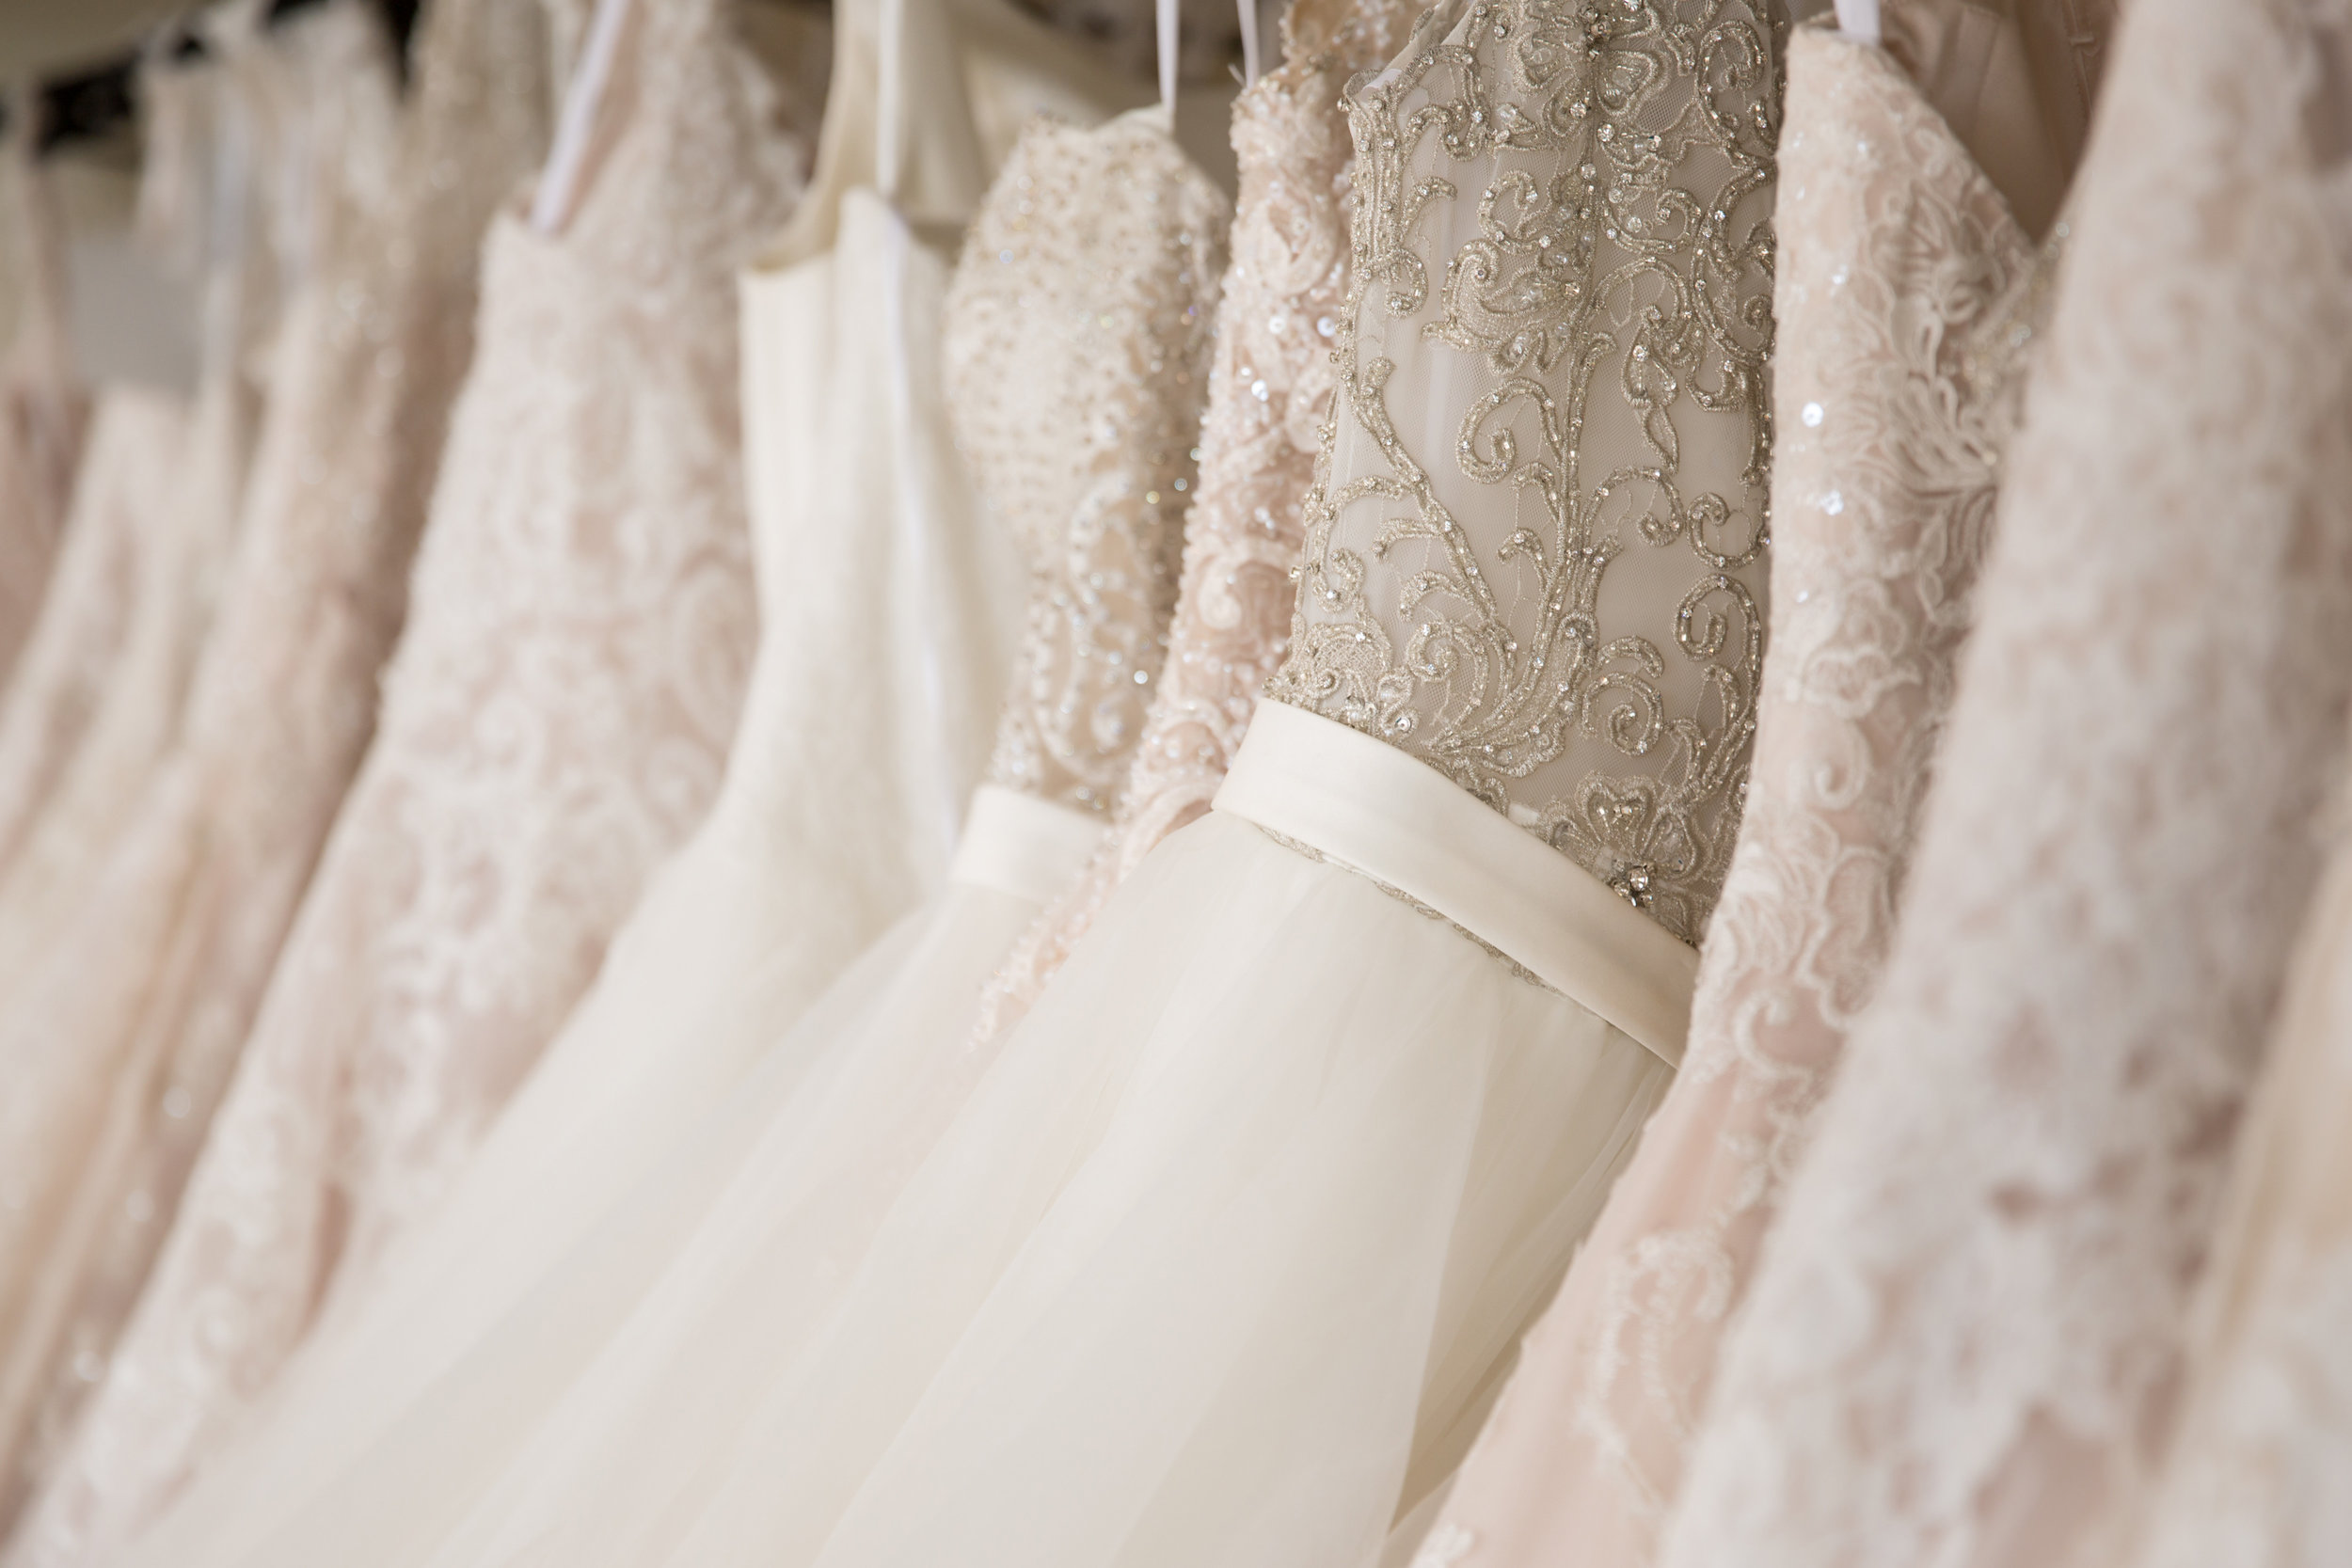 Baton Rouge Wedding Dress - 1